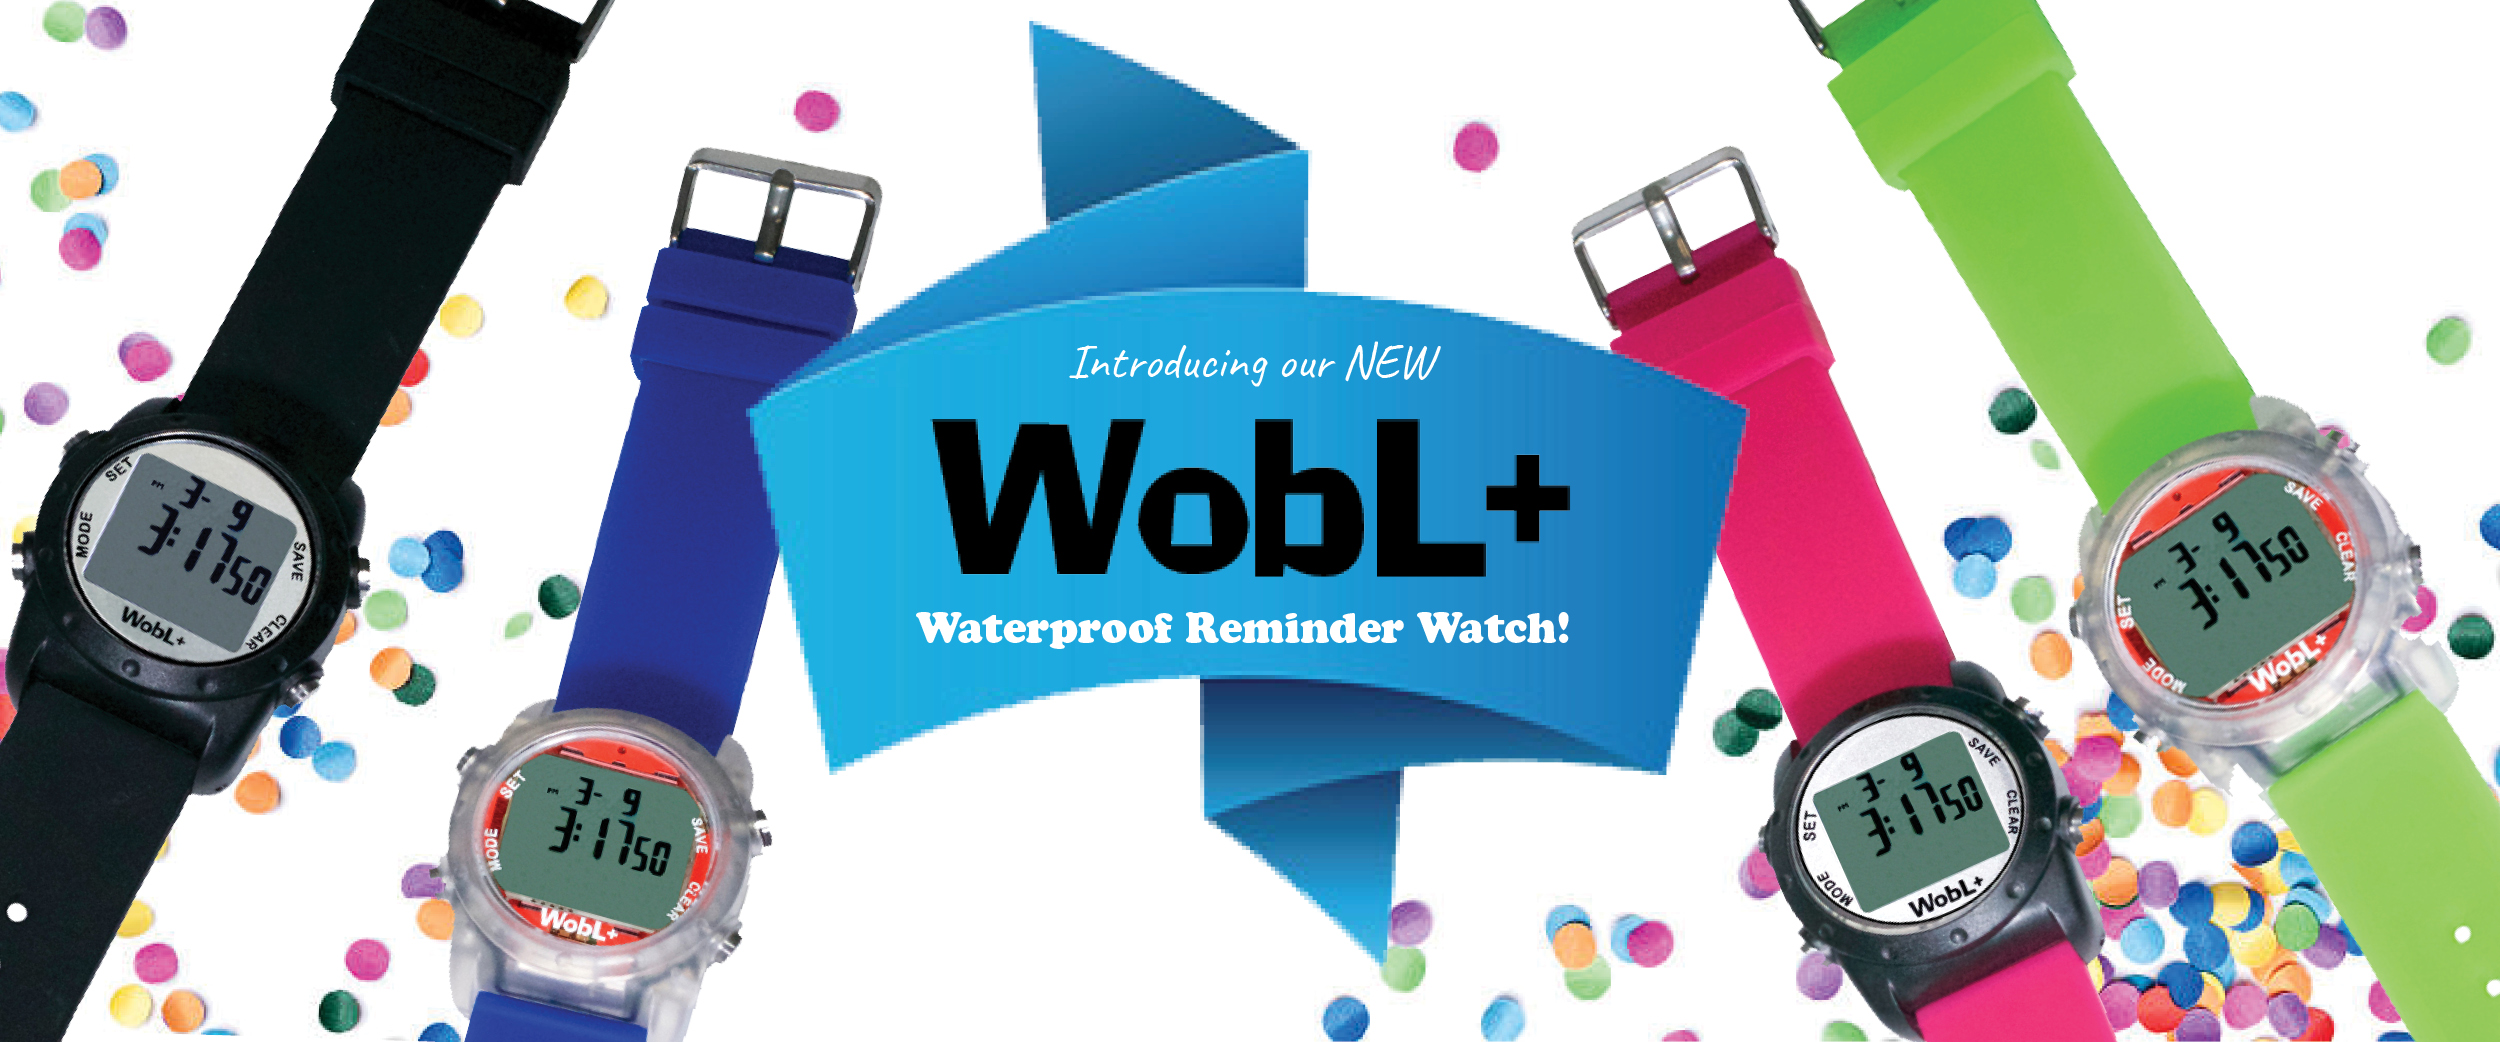 wobl-release-banner.jpg